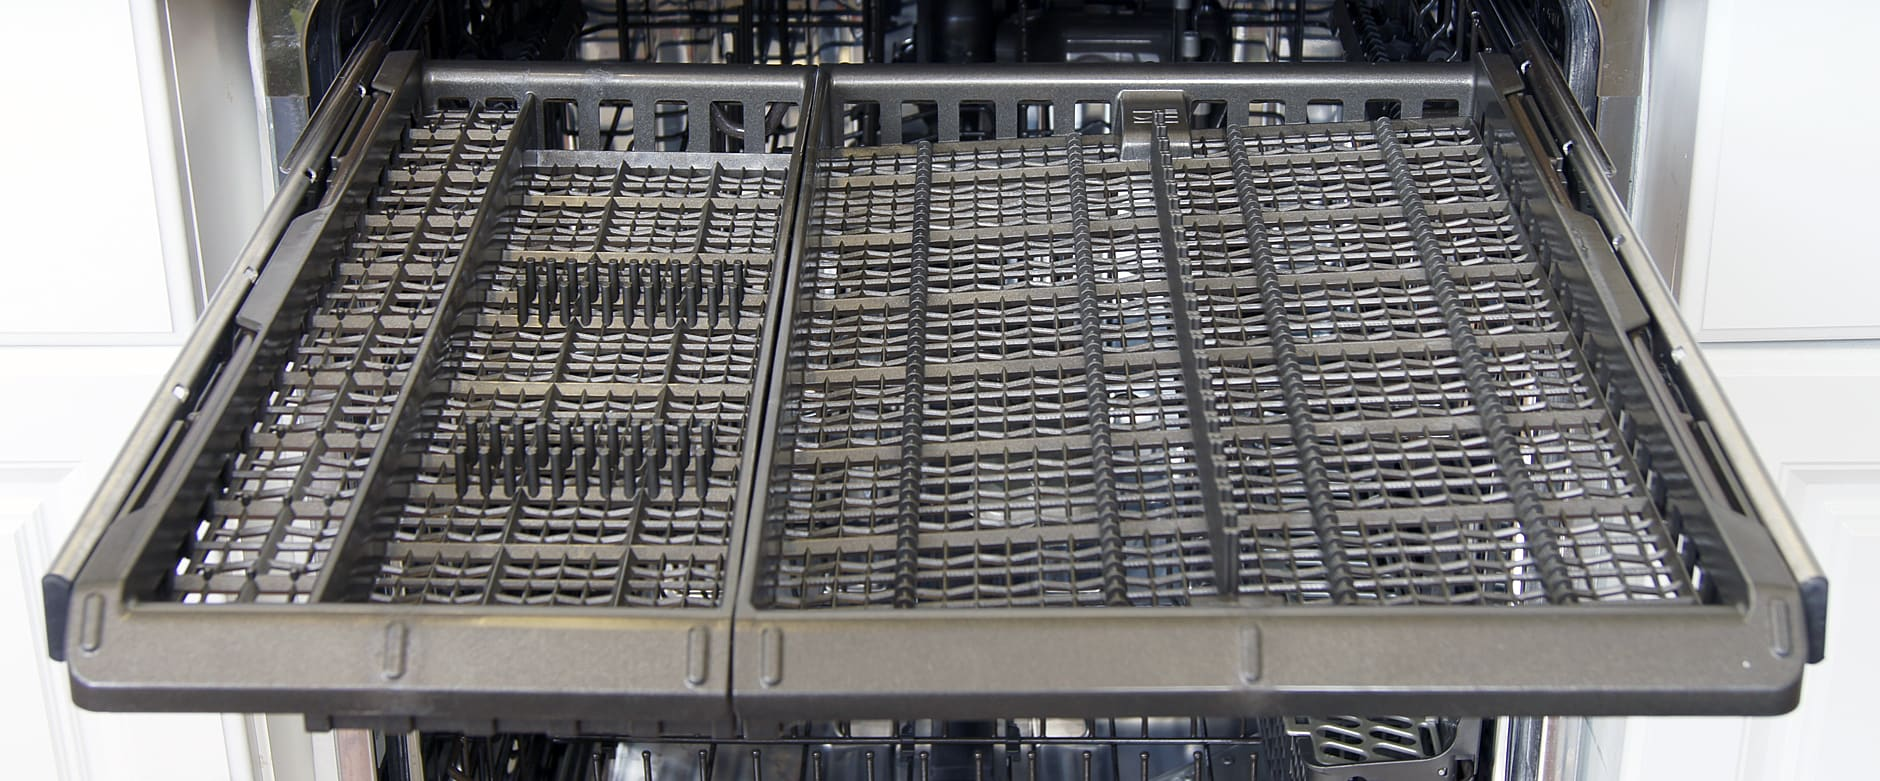 GE Profile PDT760SSFSS third rack